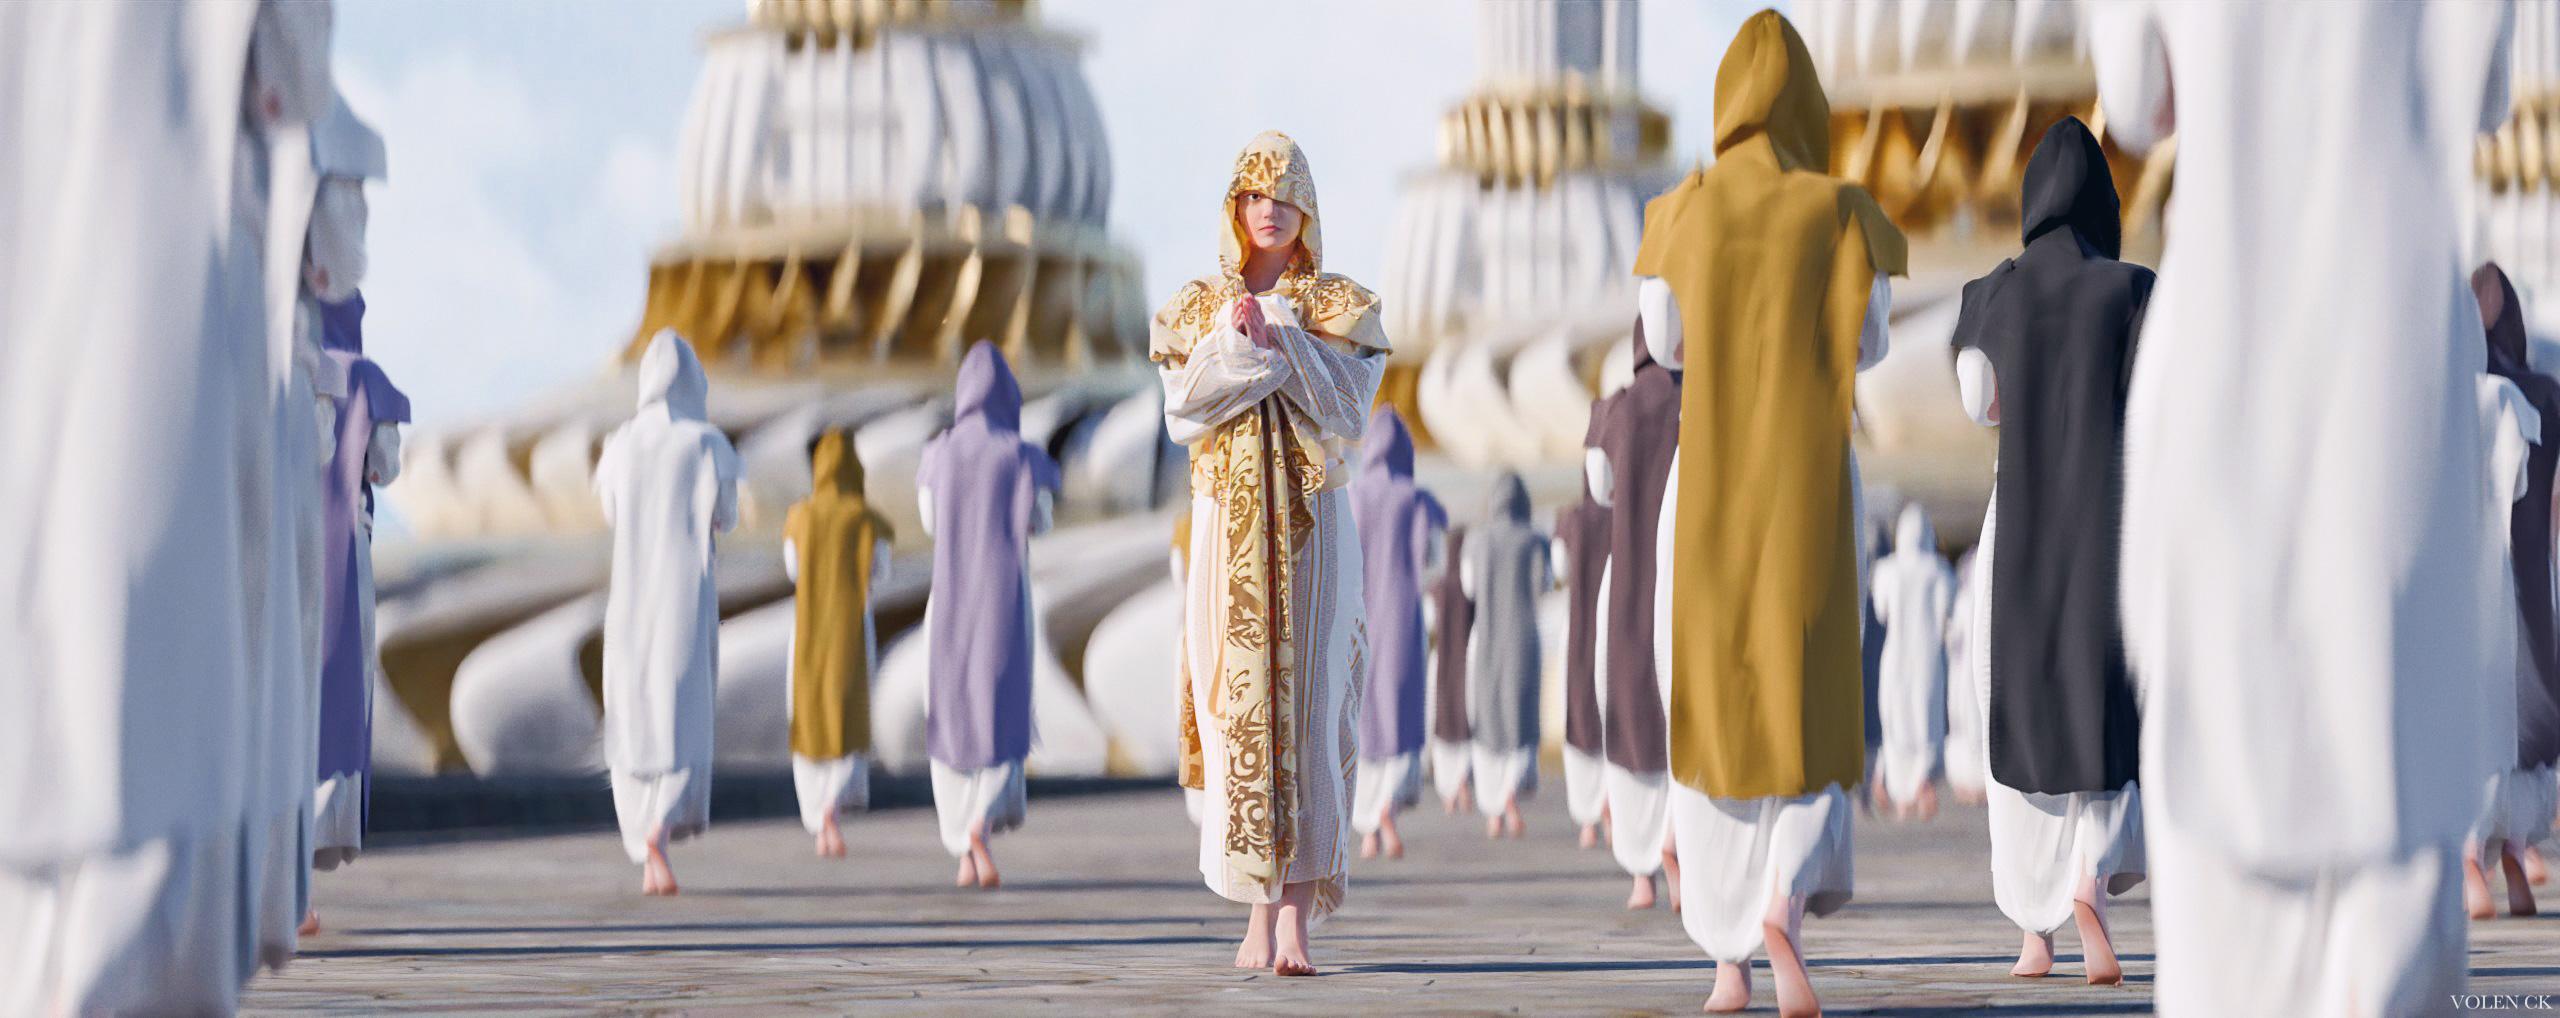 The-White-Temple-Pilgrims—Volen-CK—14